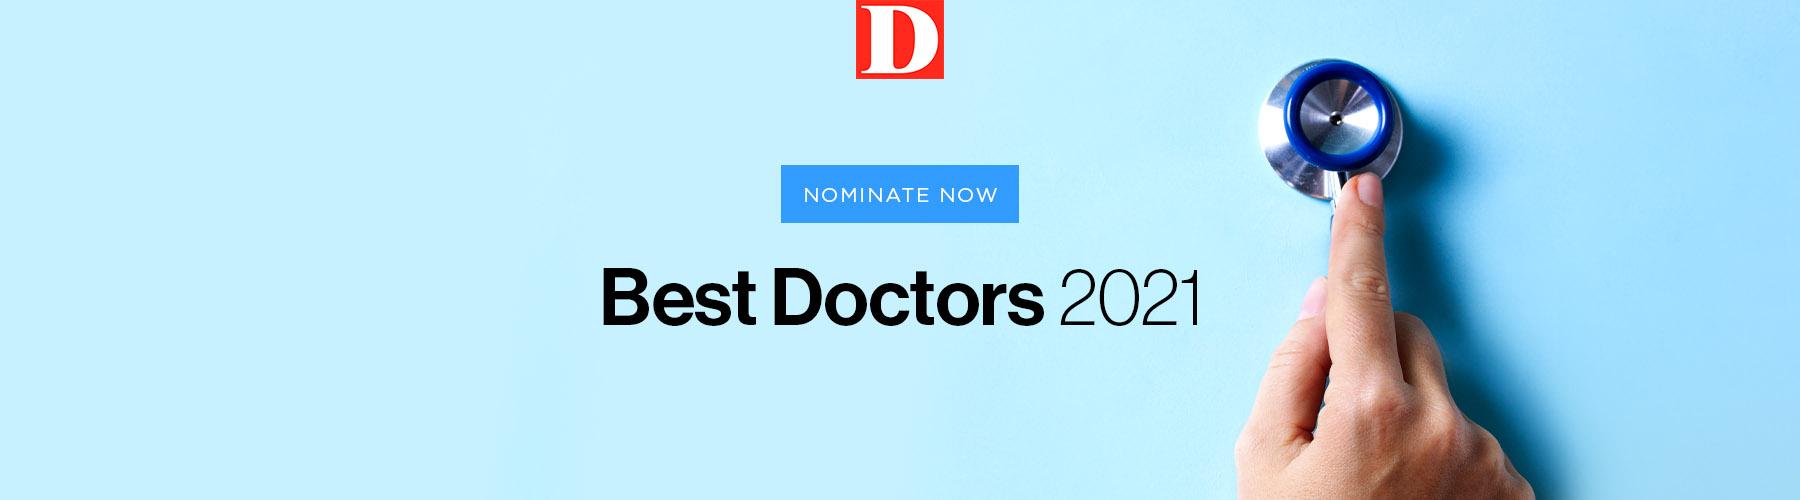 2021 Best Doctors Form Header